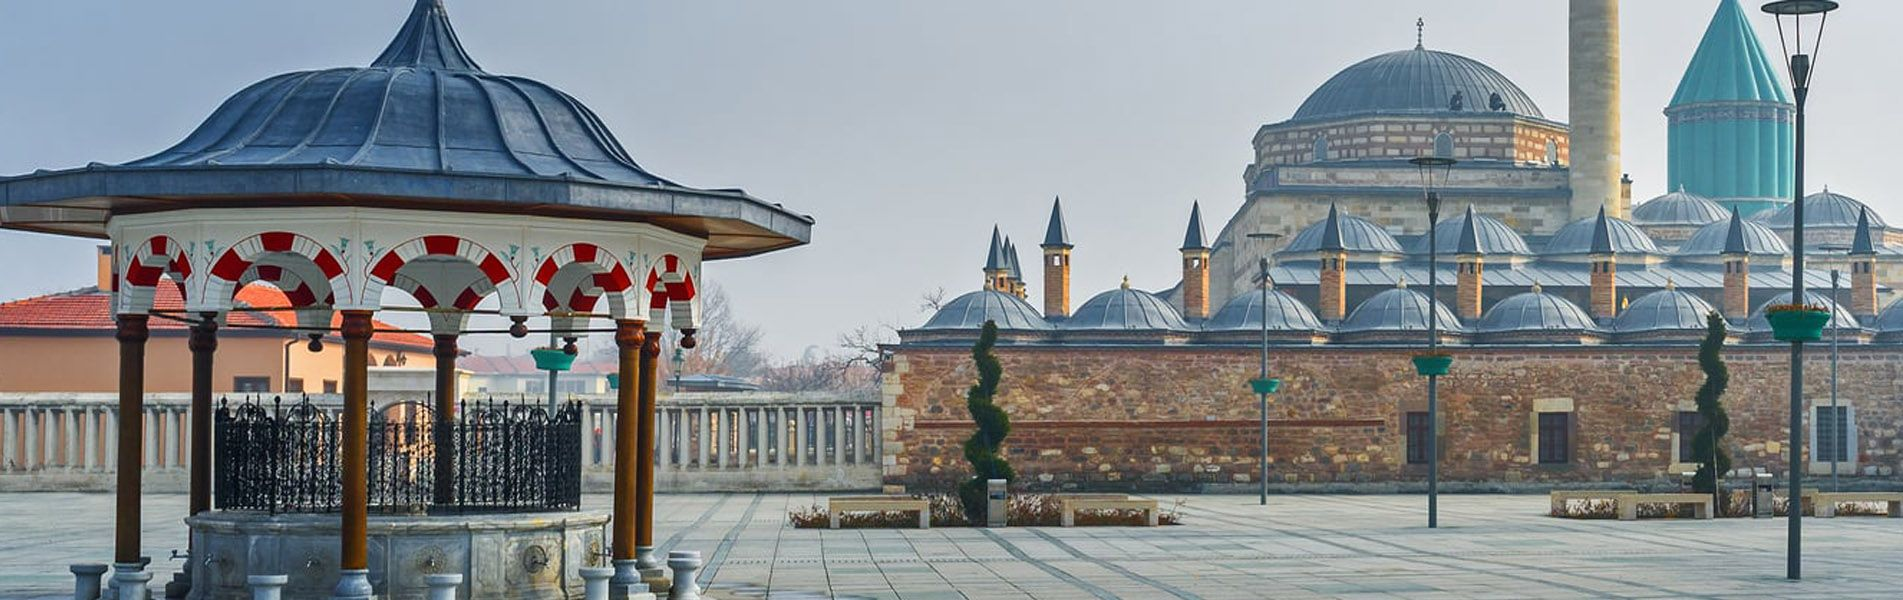 Konya en Turquía